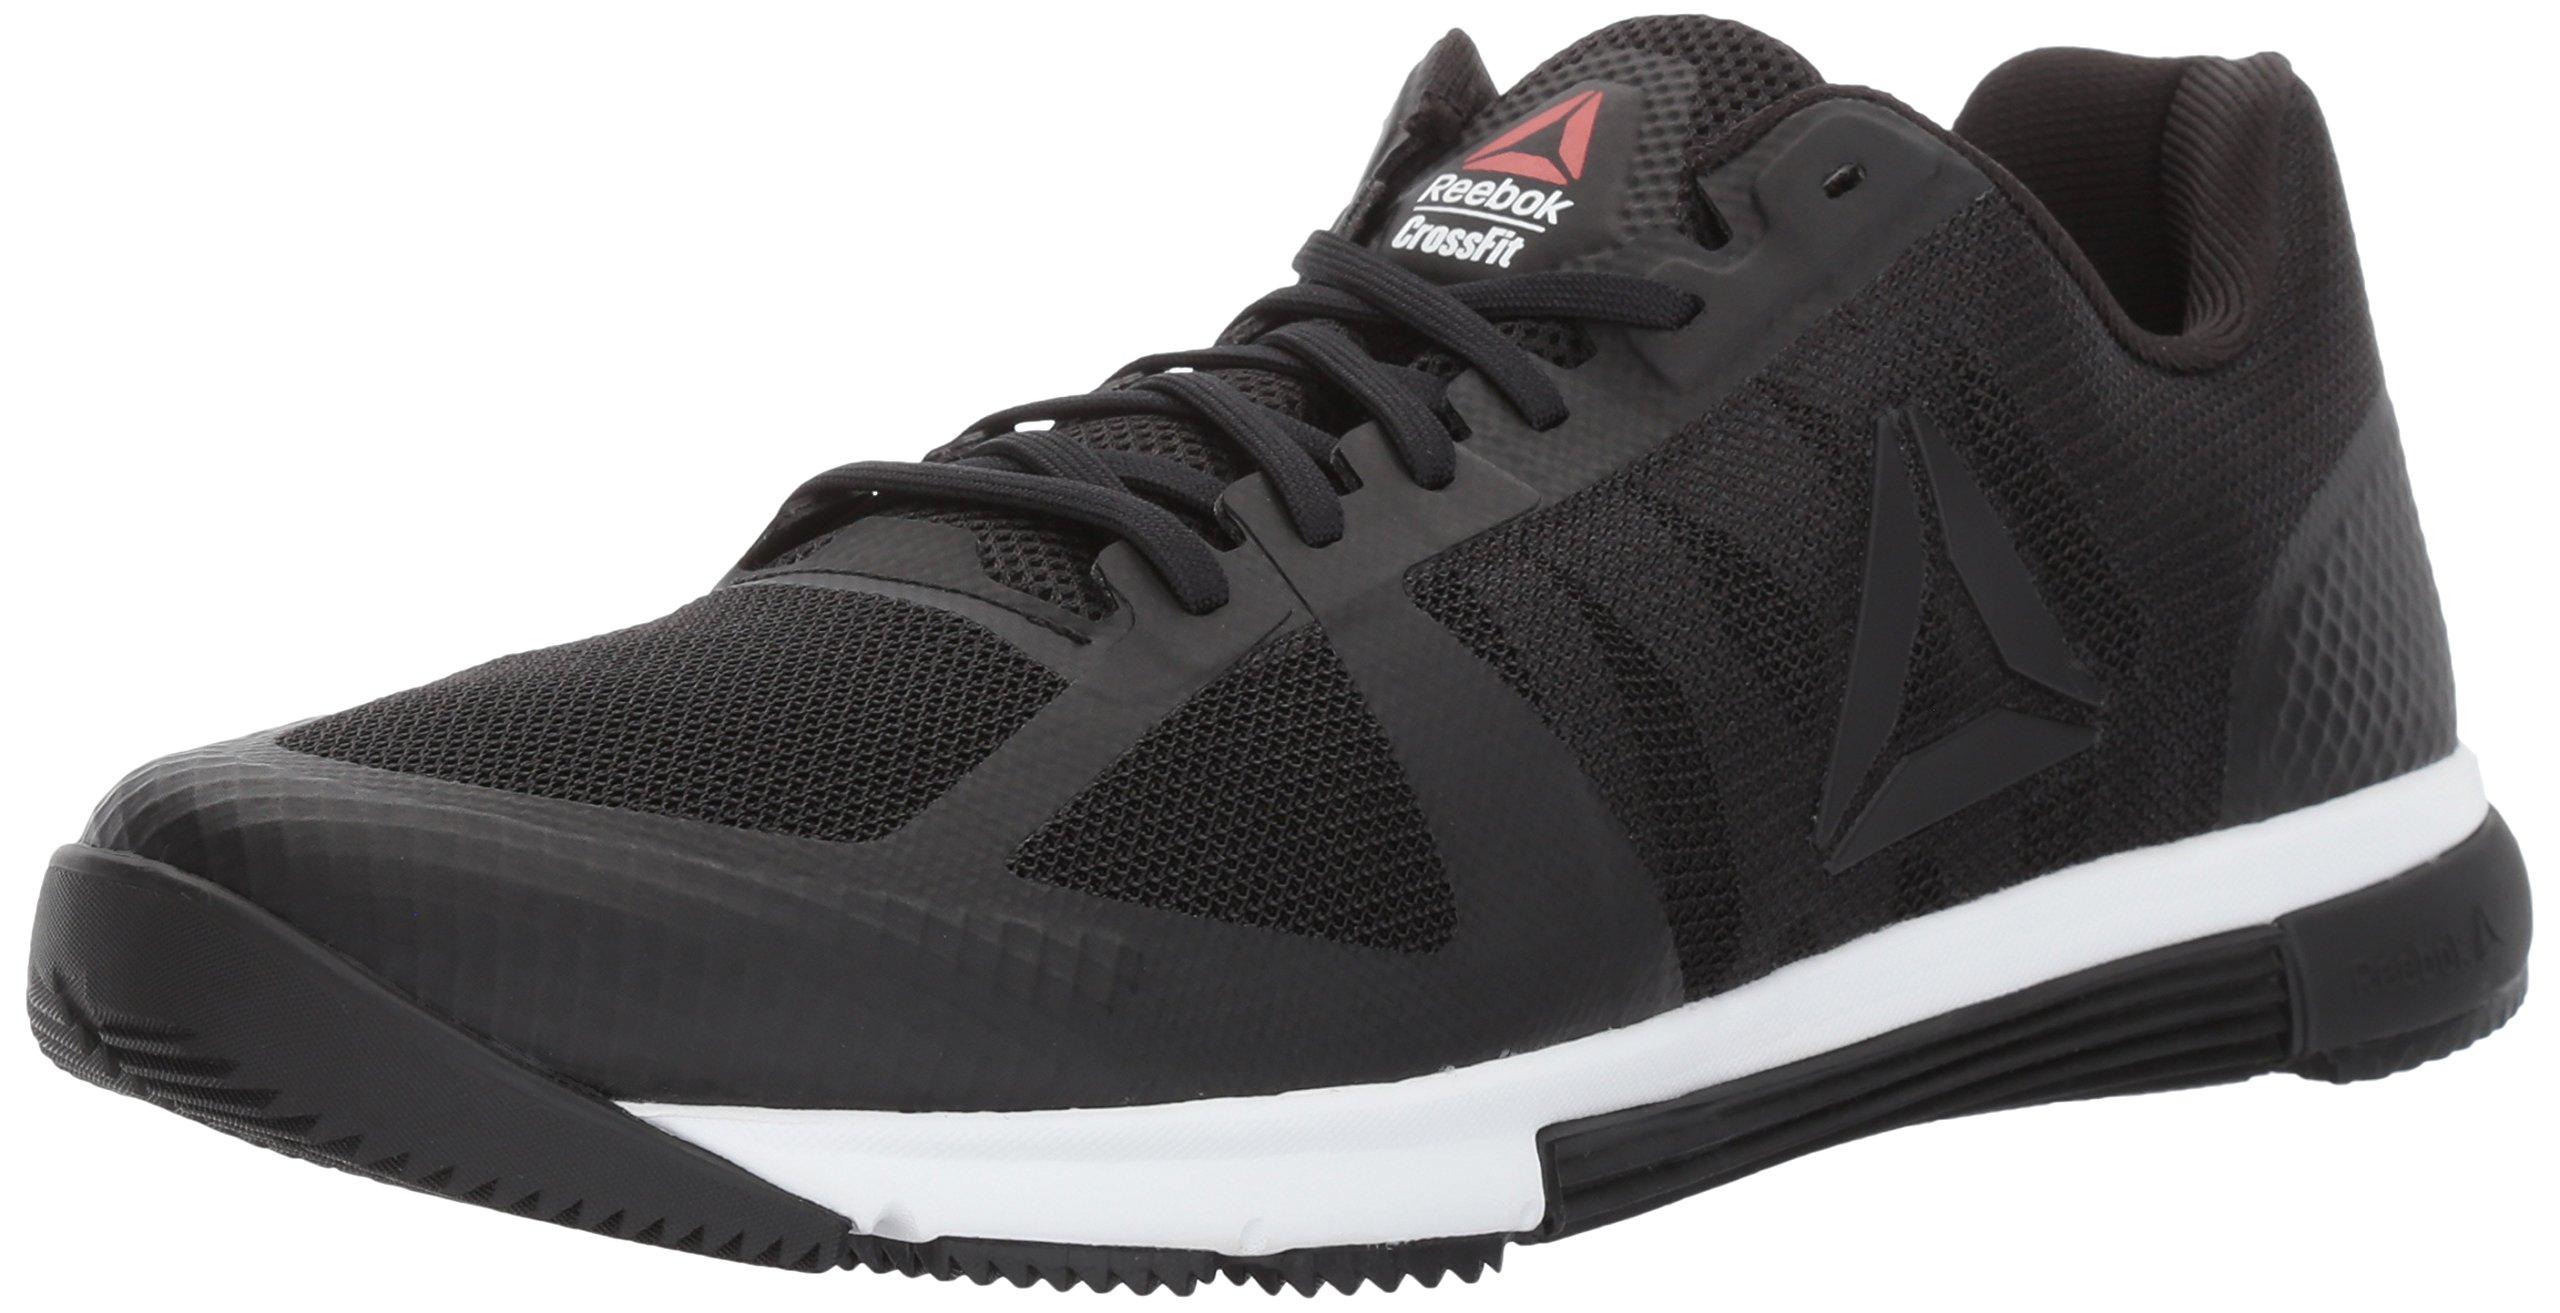 Reebok Men's Crossfit Speed TR 2.0 Cross-Trainer Shoe, Black/White/Primal Red, 11.5 M US by Reebok